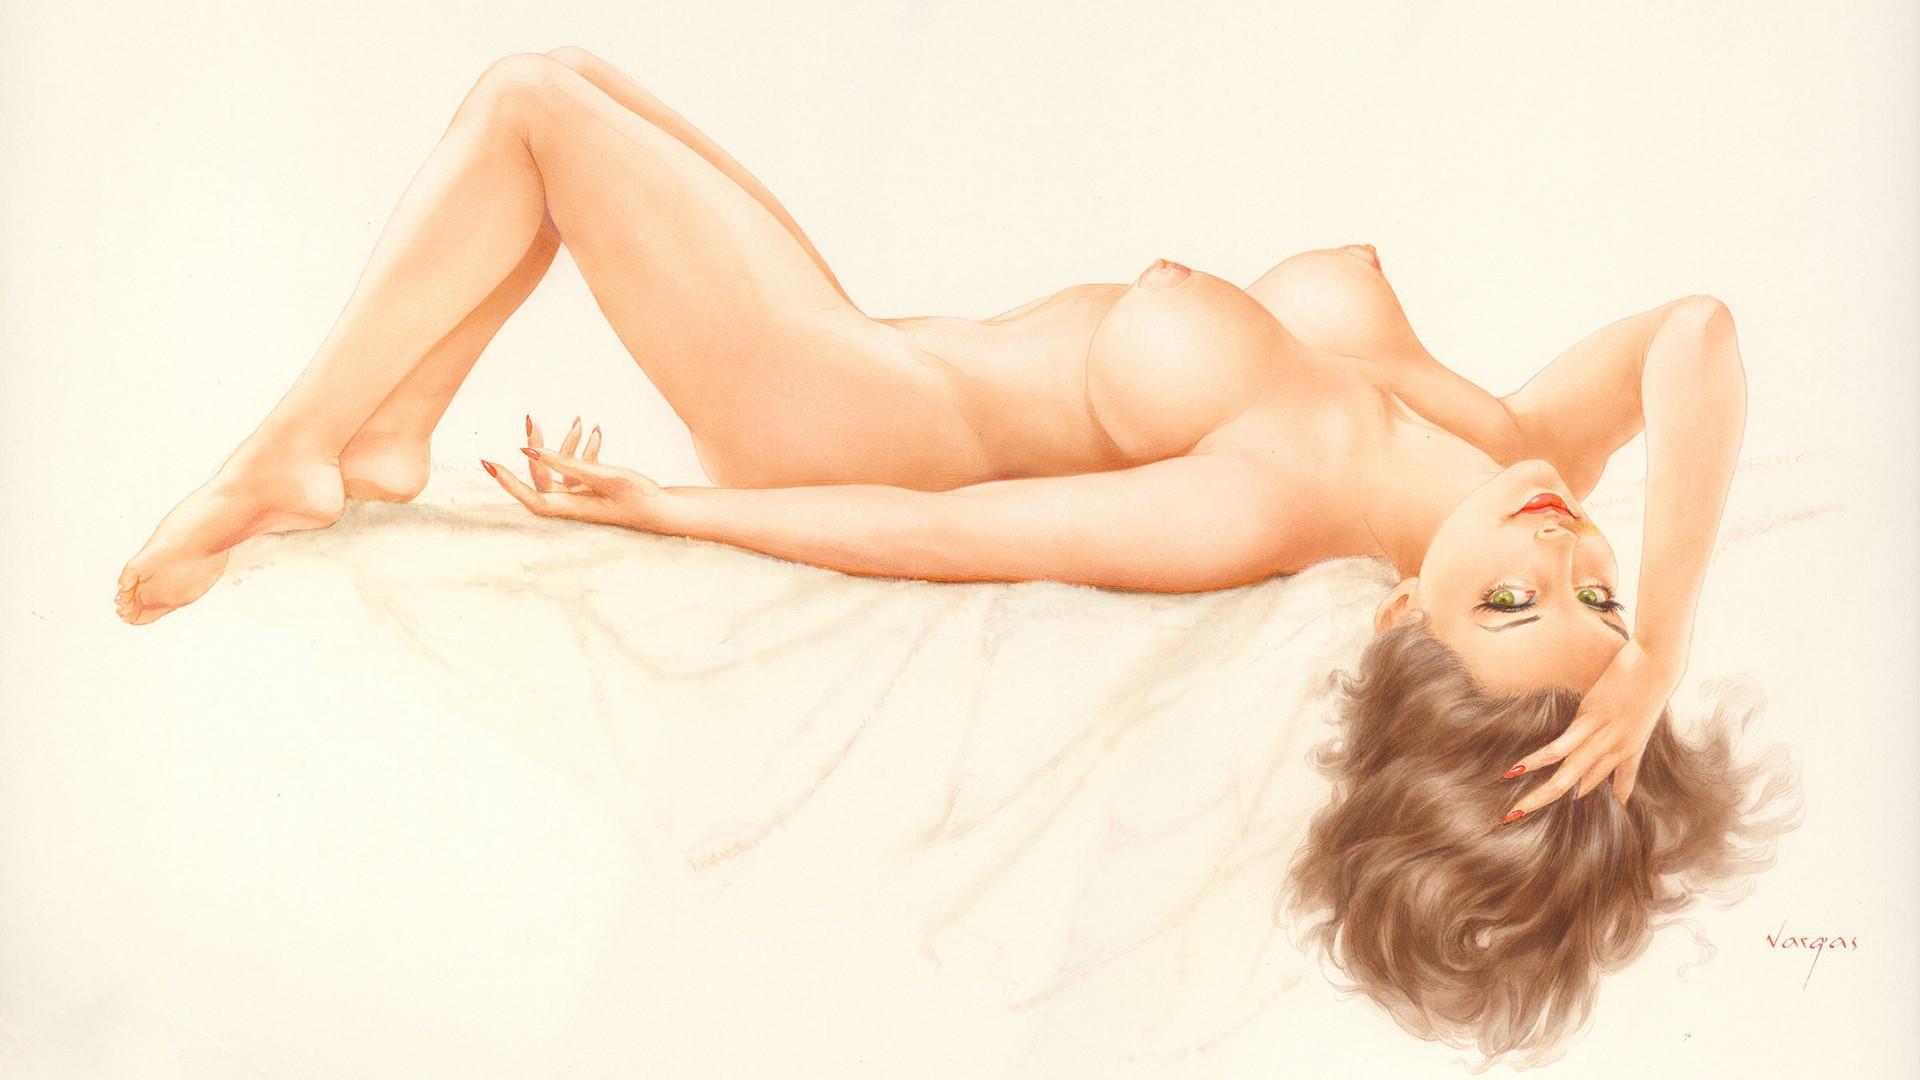 Naked Pinup Wallpaper 5686-1978